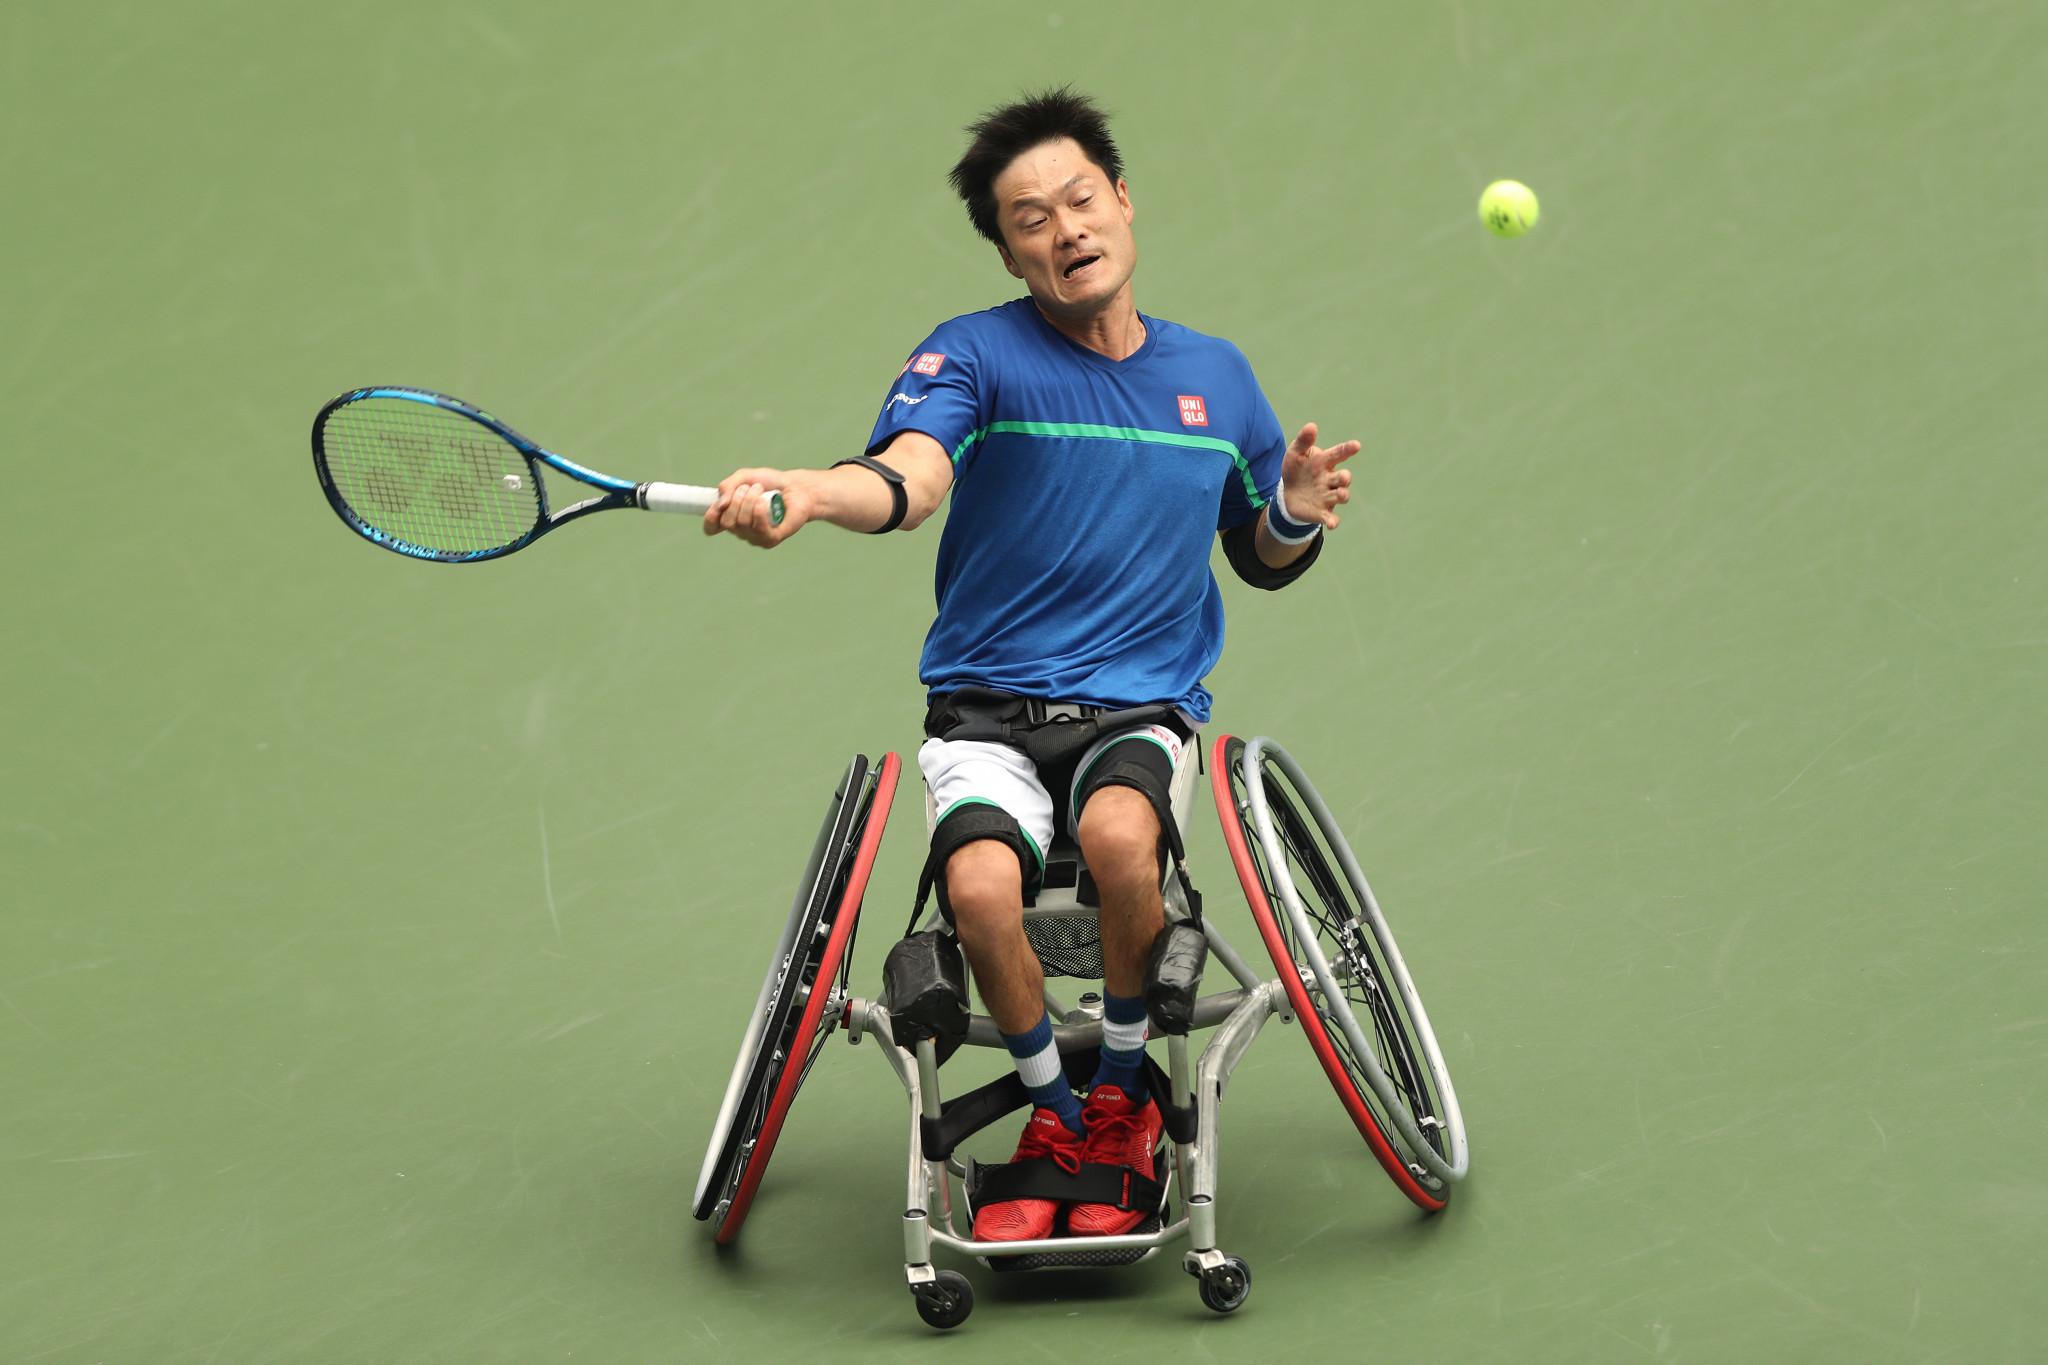 ITF confirms wheelchair tennis field for Tokyo 2020 Paralympics